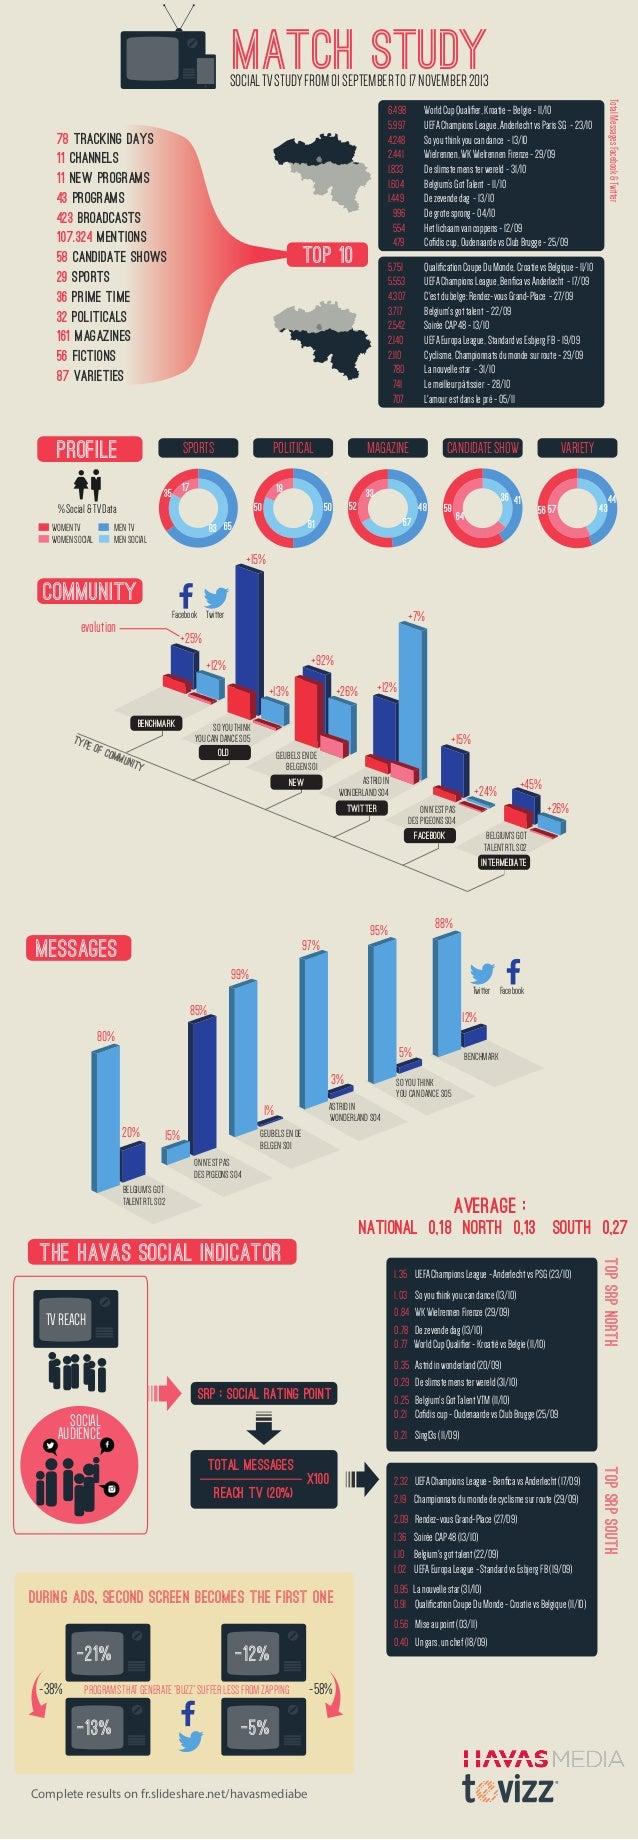 MATCH STUDY  SOCIAL TV STUDY FROM 01 SEPTEMBER TO 17 NOVEMBER 2013  SPORTS  PROFILE  POLITICAL  35 17 WOMEN TV WOMEN SOCIA...